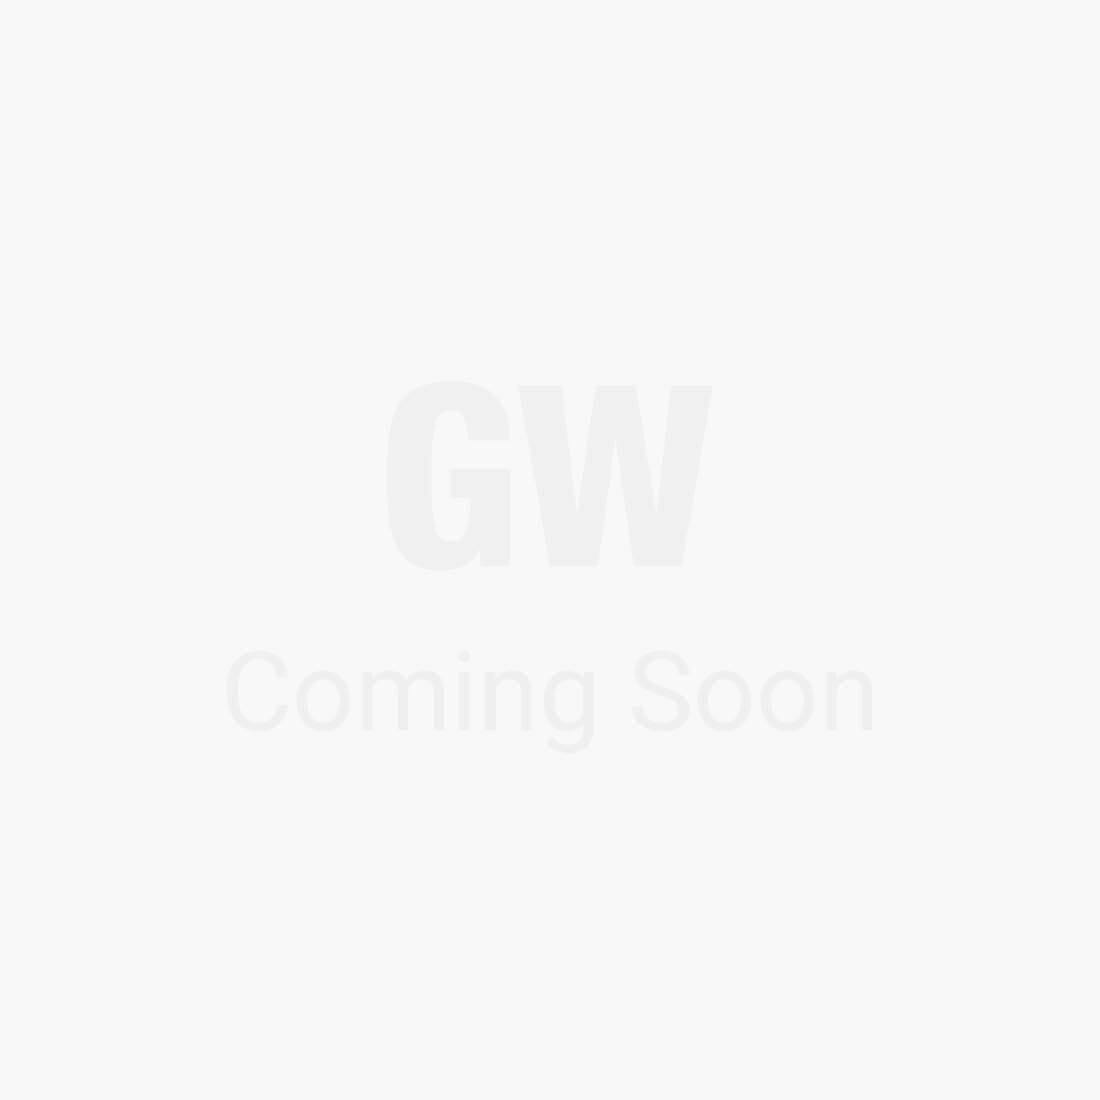 Groovy Baha Sofa Lounge Chair Globewest Frankydiablos Diy Chair Ideas Frankydiabloscom